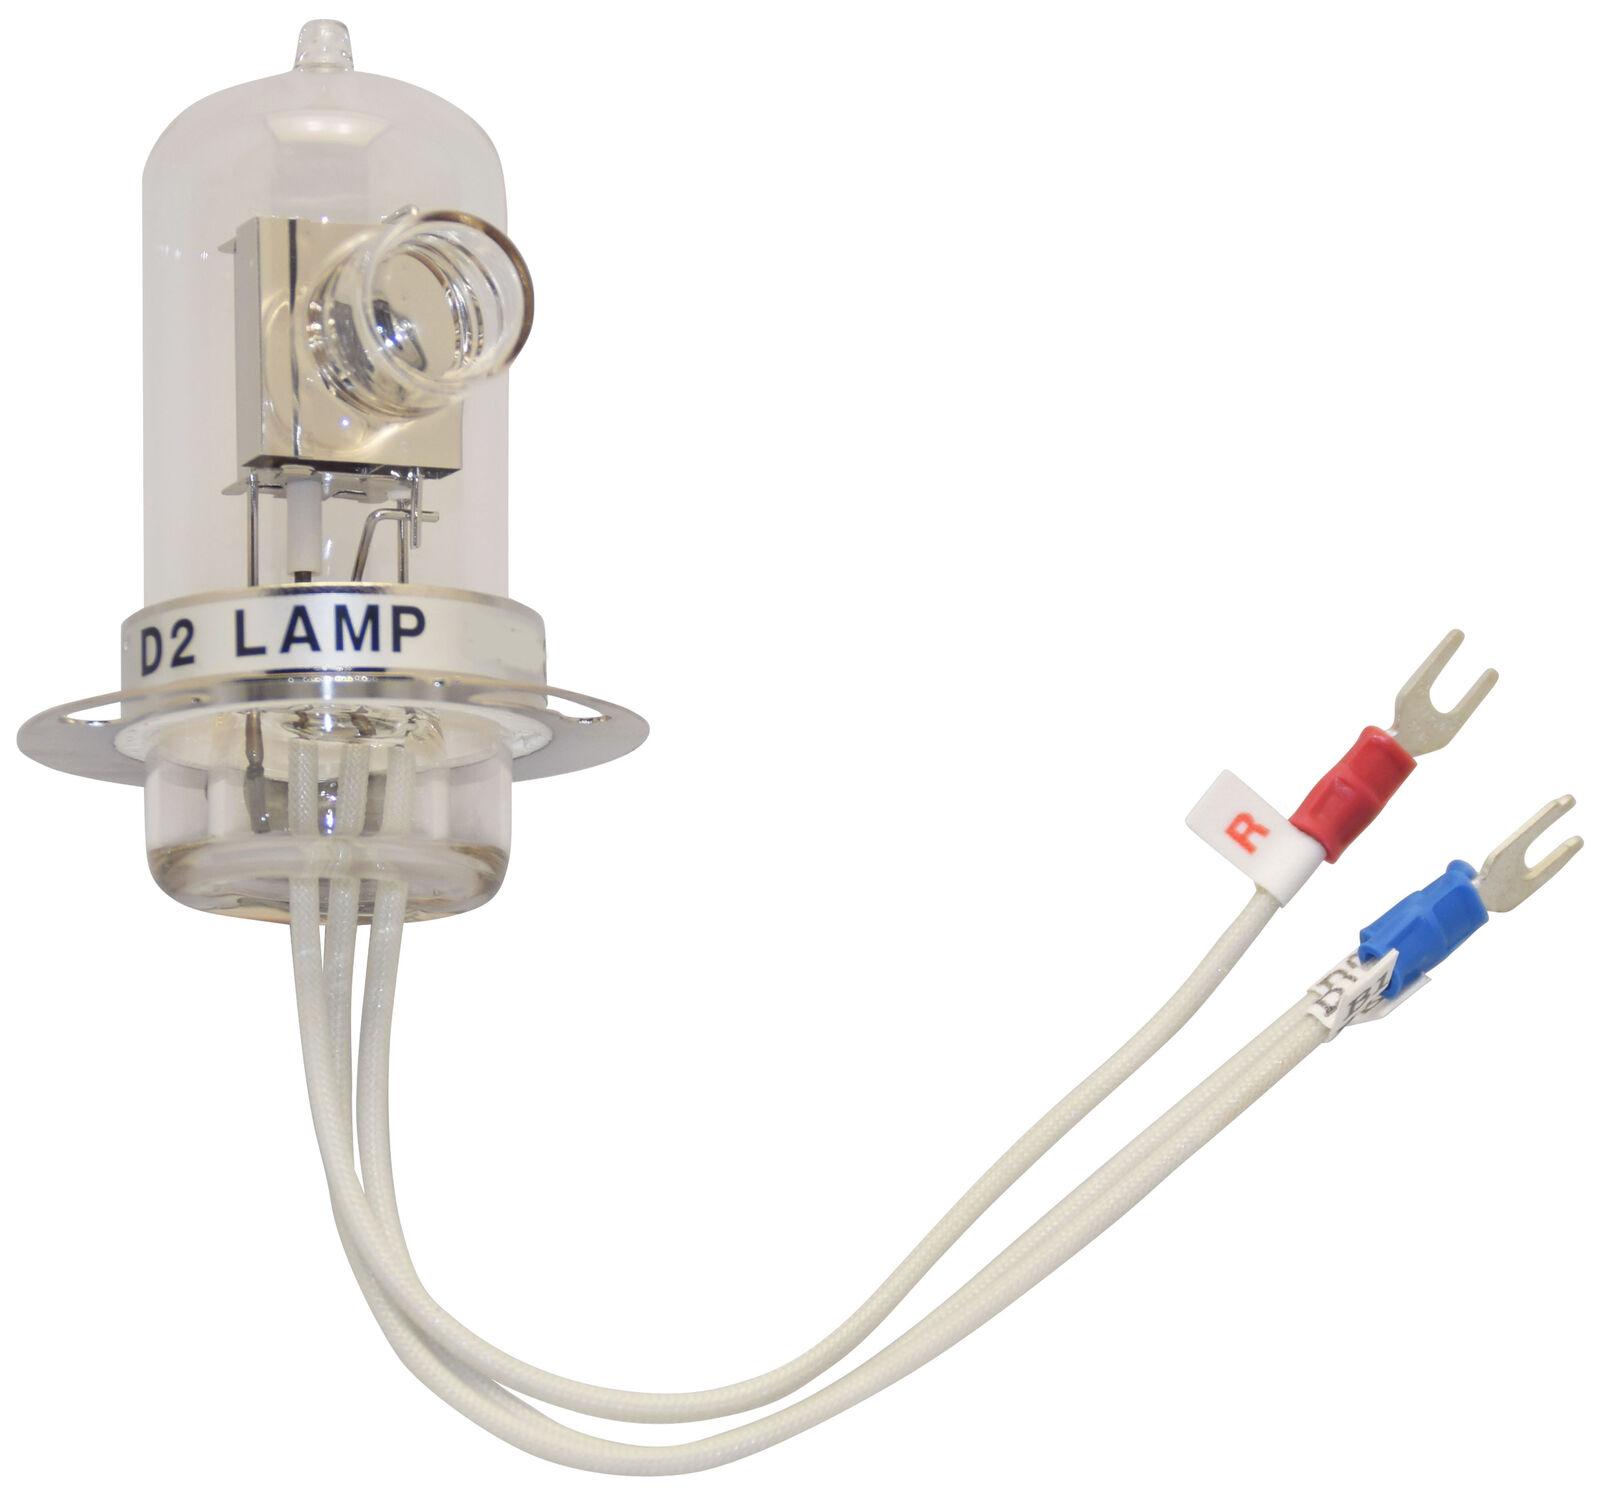 REPLACEMENT BULB FOR PERKIN ELMER C6957529, C6957529 DEUTERIUM LAMP